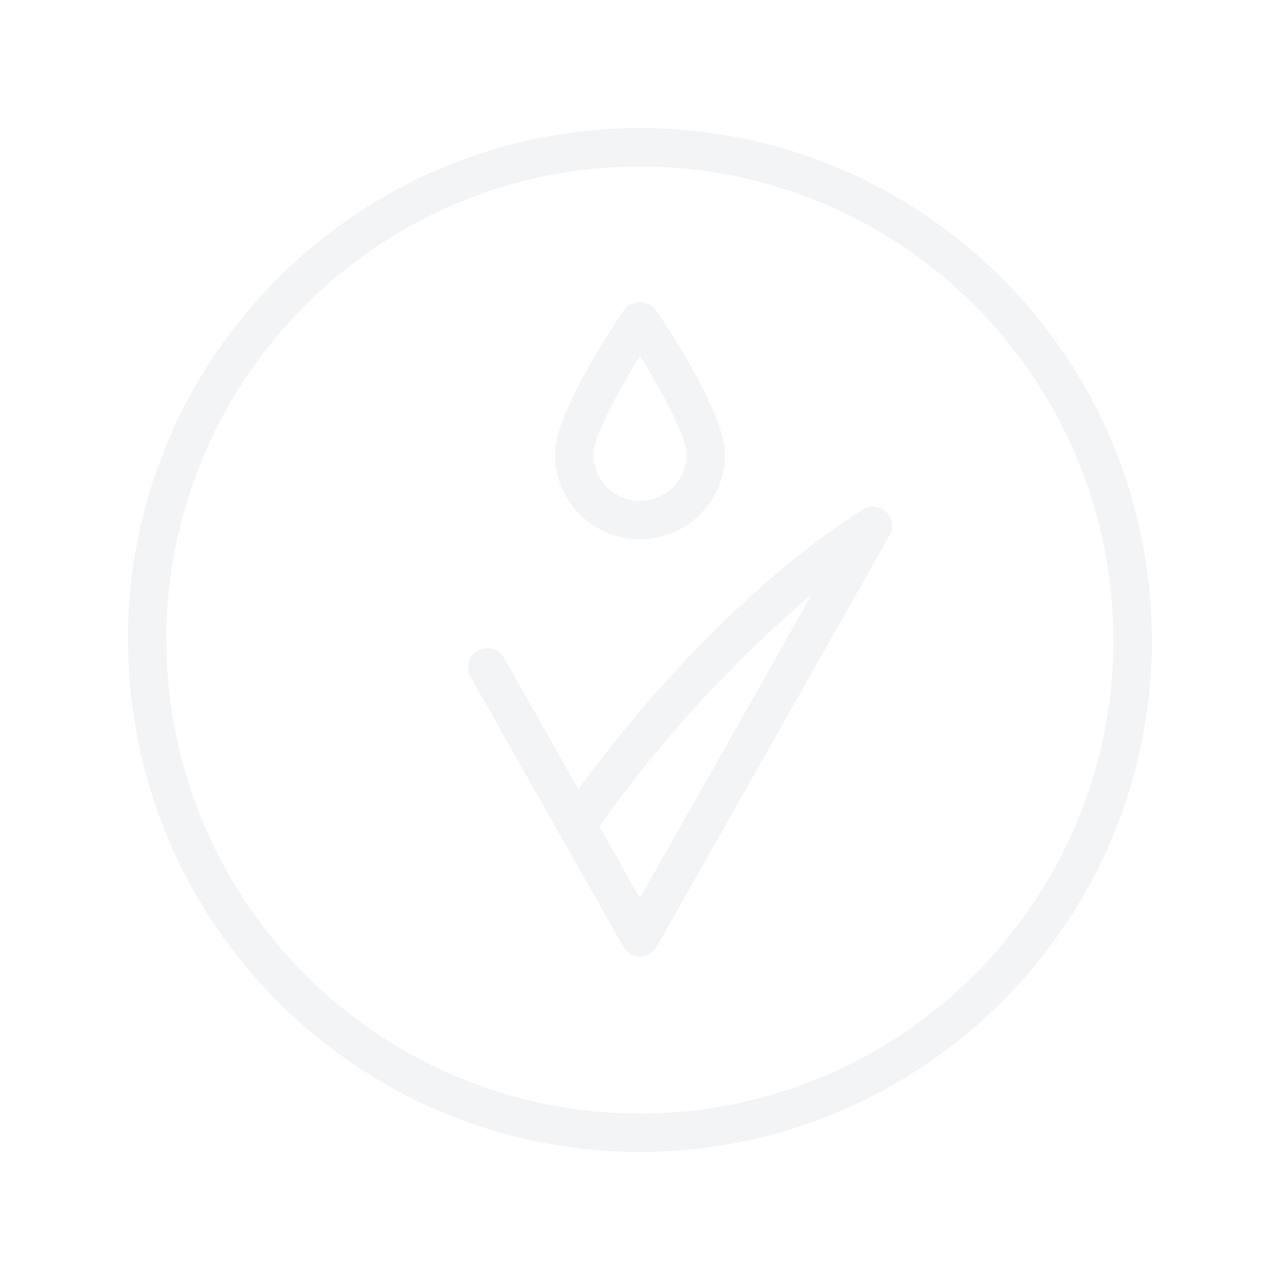 a872d247 Dolce & Gabbana Light Blue 100ml Eau De Toilette Gift Set | LOVERTE